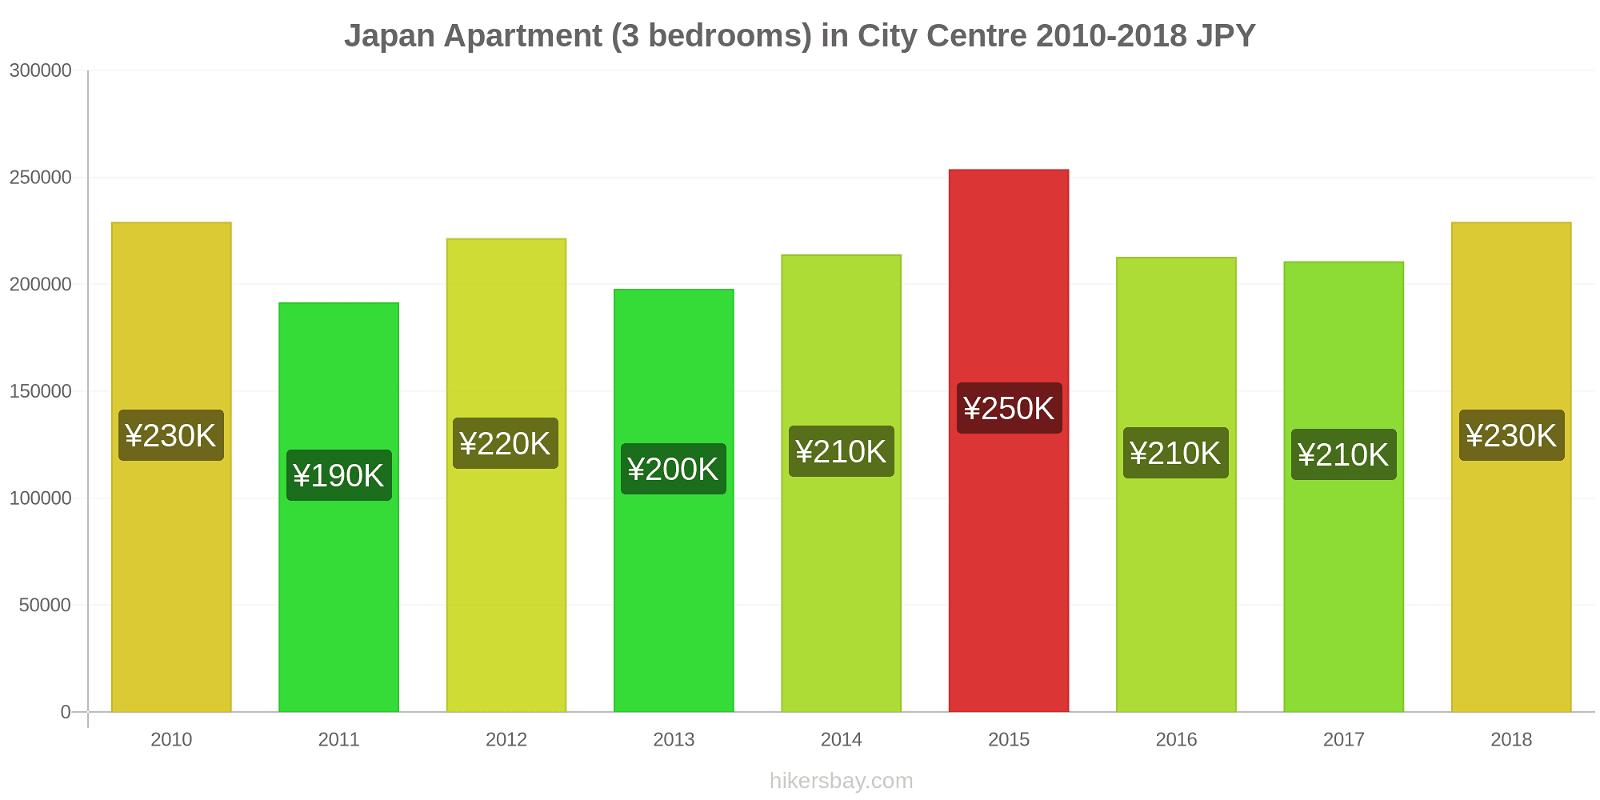 Japan price changes Apartment (3 bedrooms) in City Centre hikersbay.com